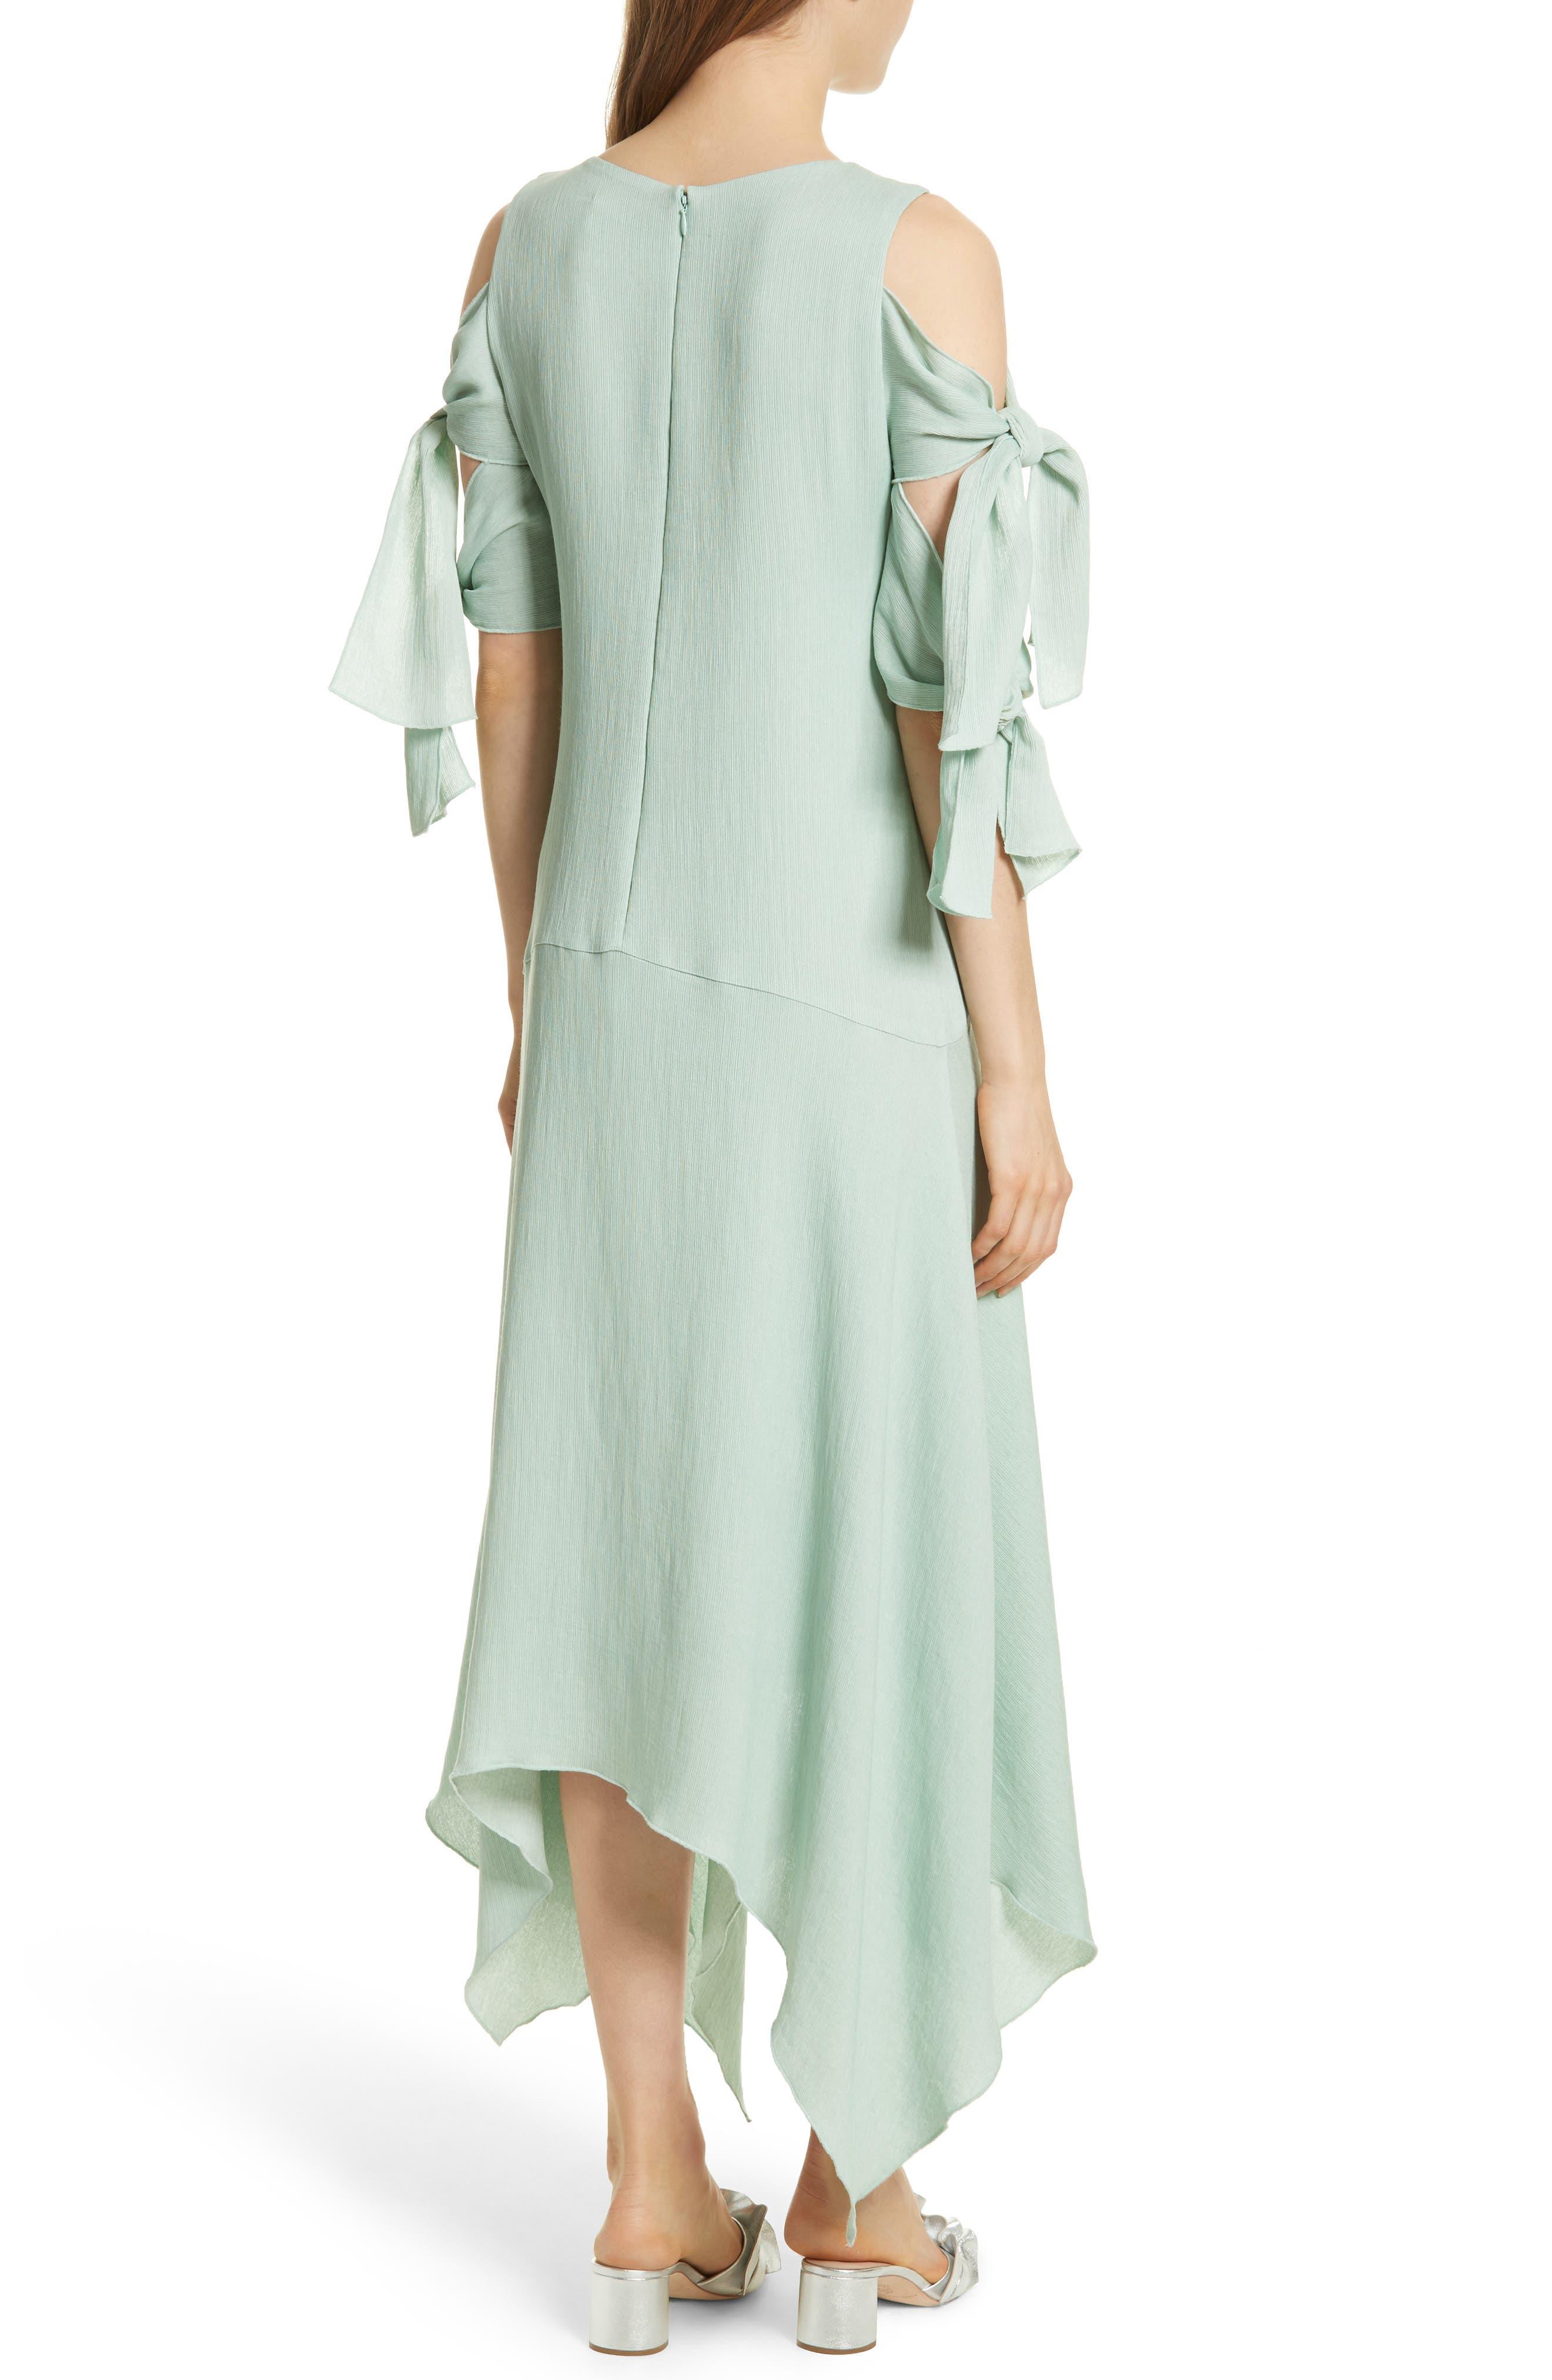 Prose & Poetry Vivianna Drop Waist Midi Dress,                             Alternate thumbnail 2, color,                             332